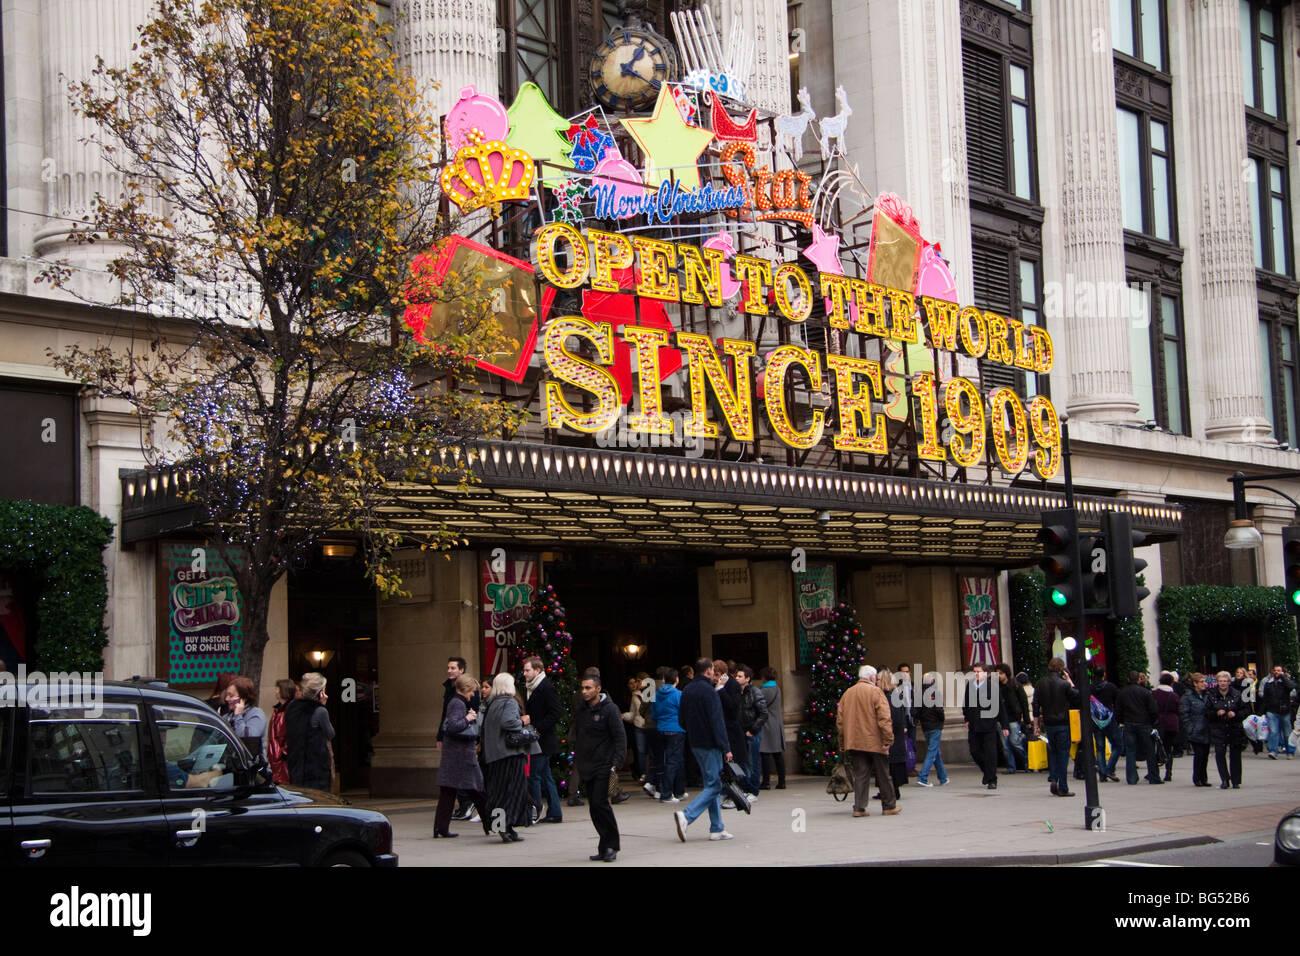 Christmas shopping, Selfridges department store, Oxford Street, London, England, UK - Stock Image